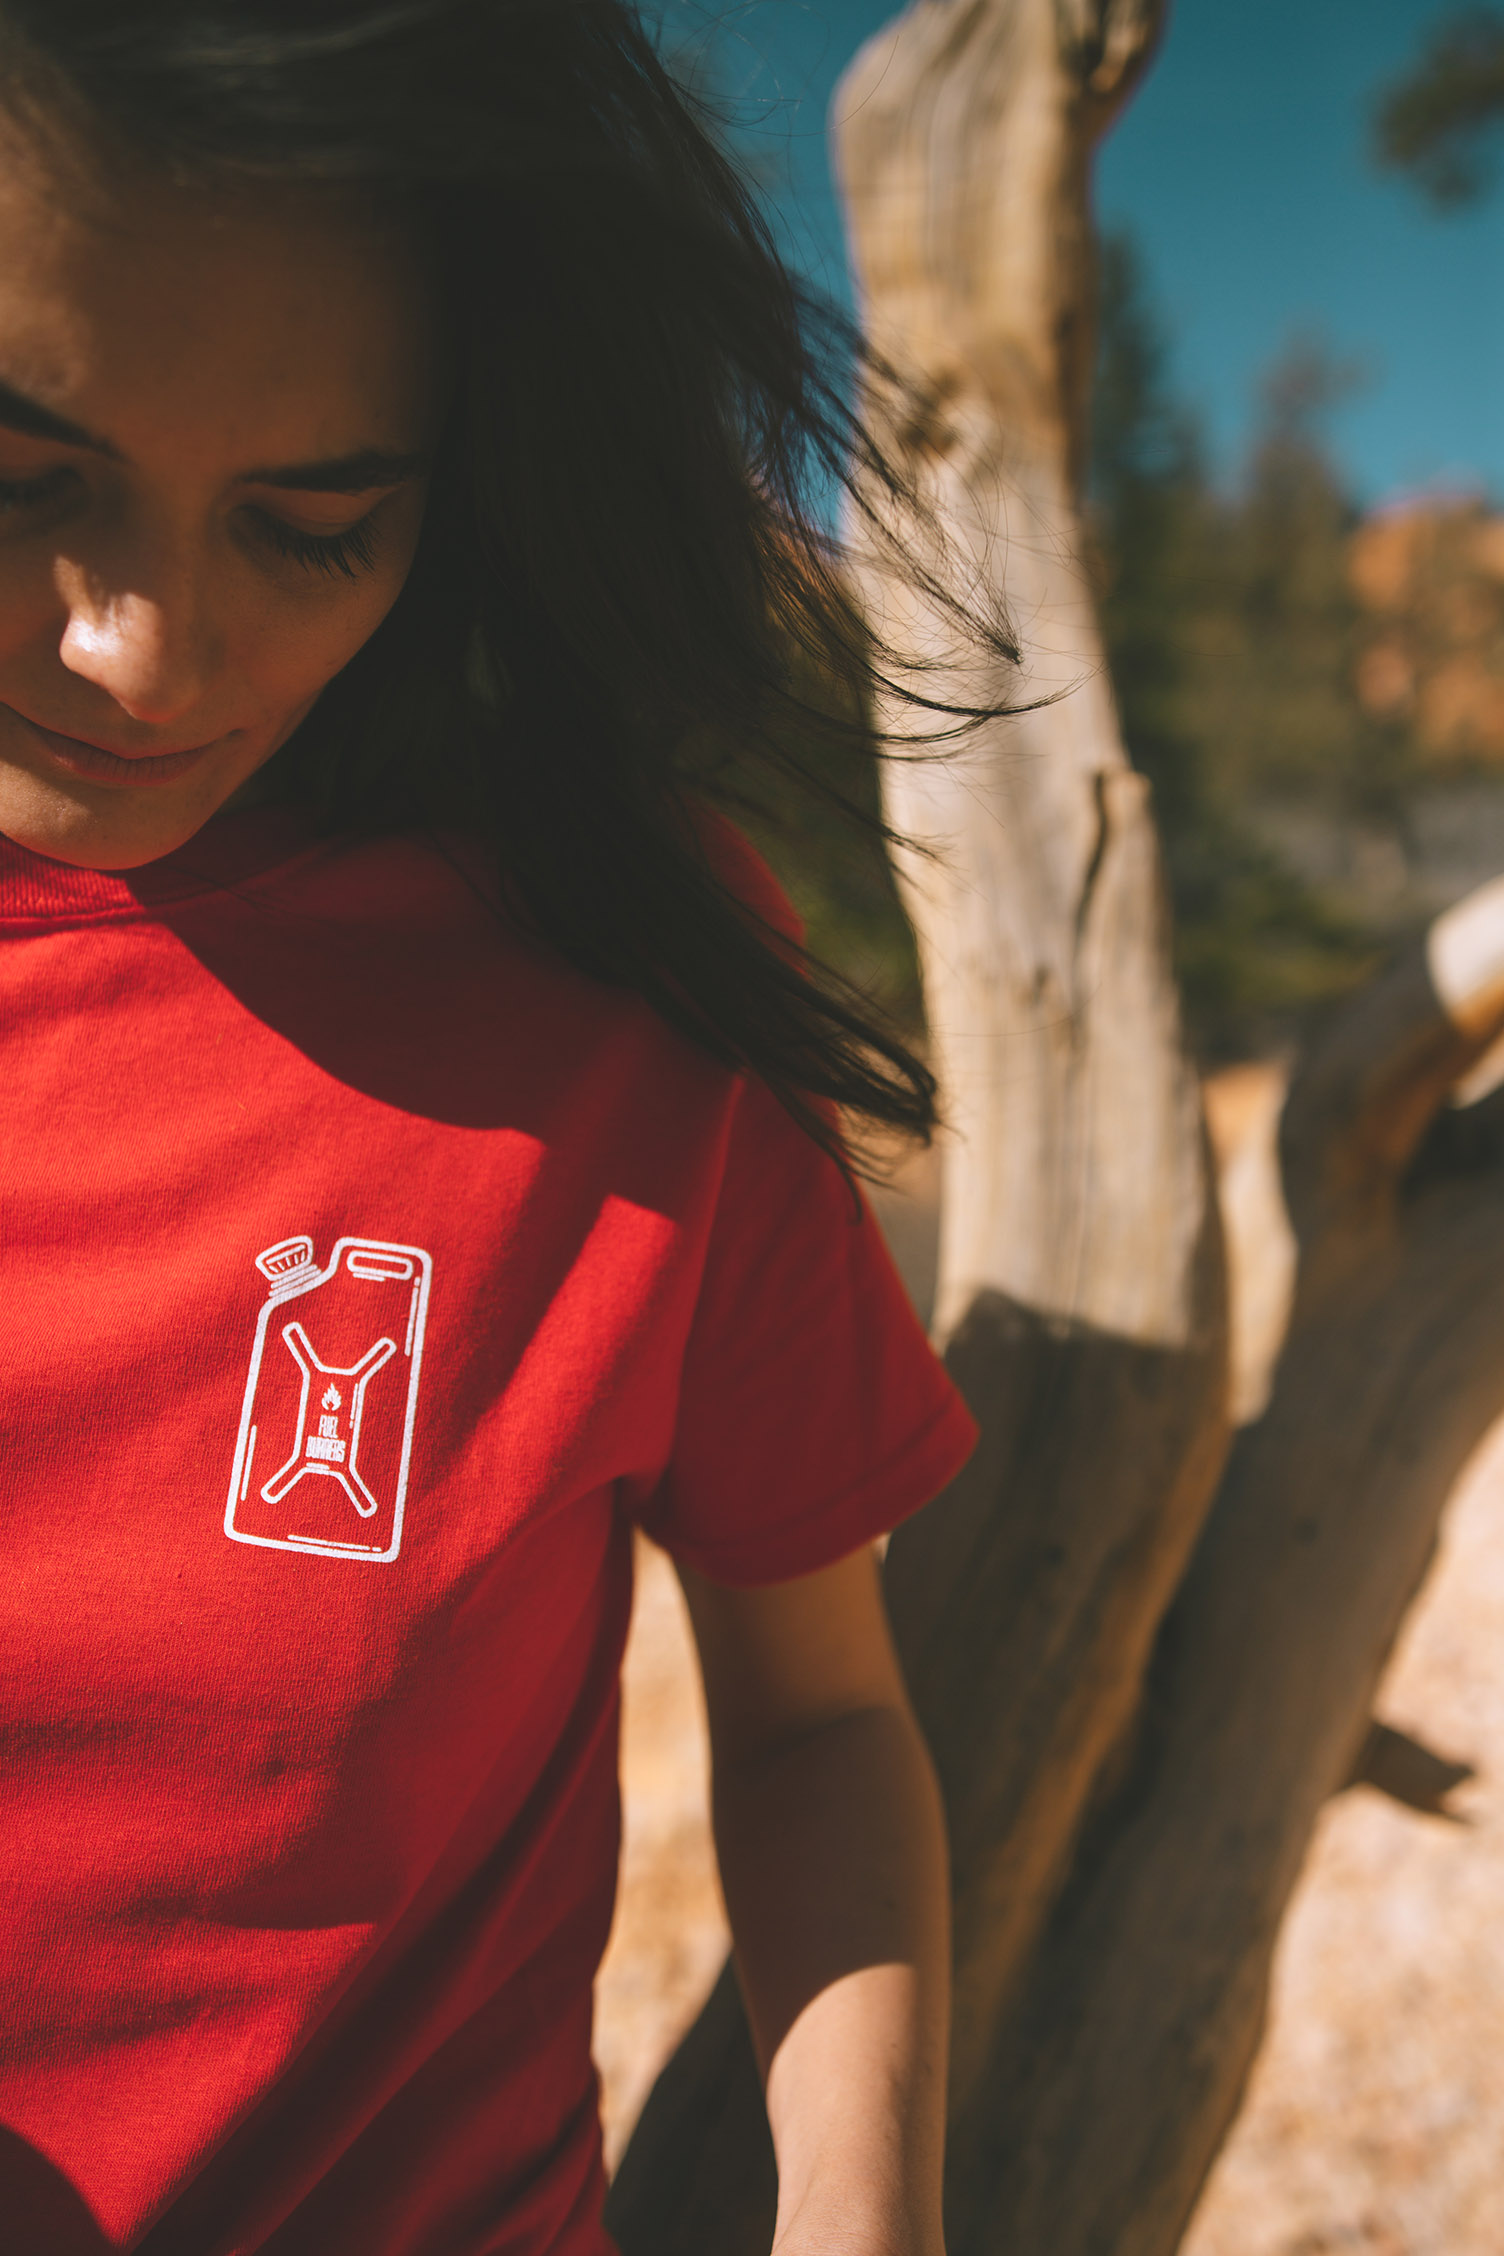 sarah-hirning-bryce-canyon-national-park-dead-rock-studios-shirt-company.jpg